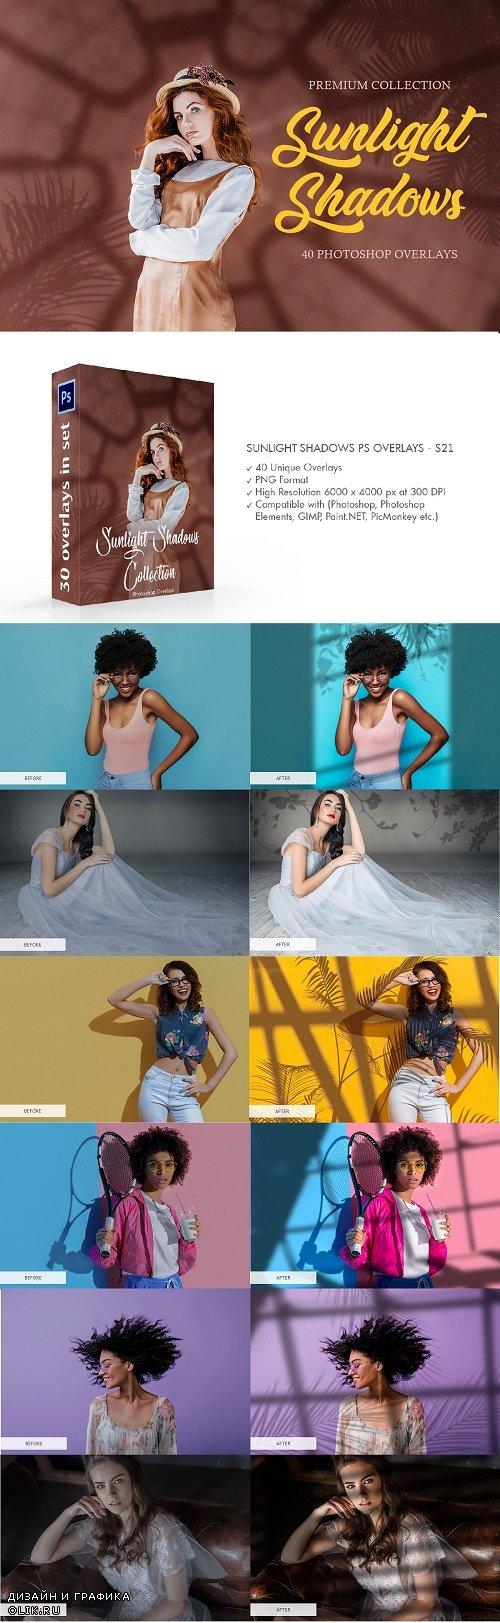 Sunlight Shadows Photoshop Overlays 3894421